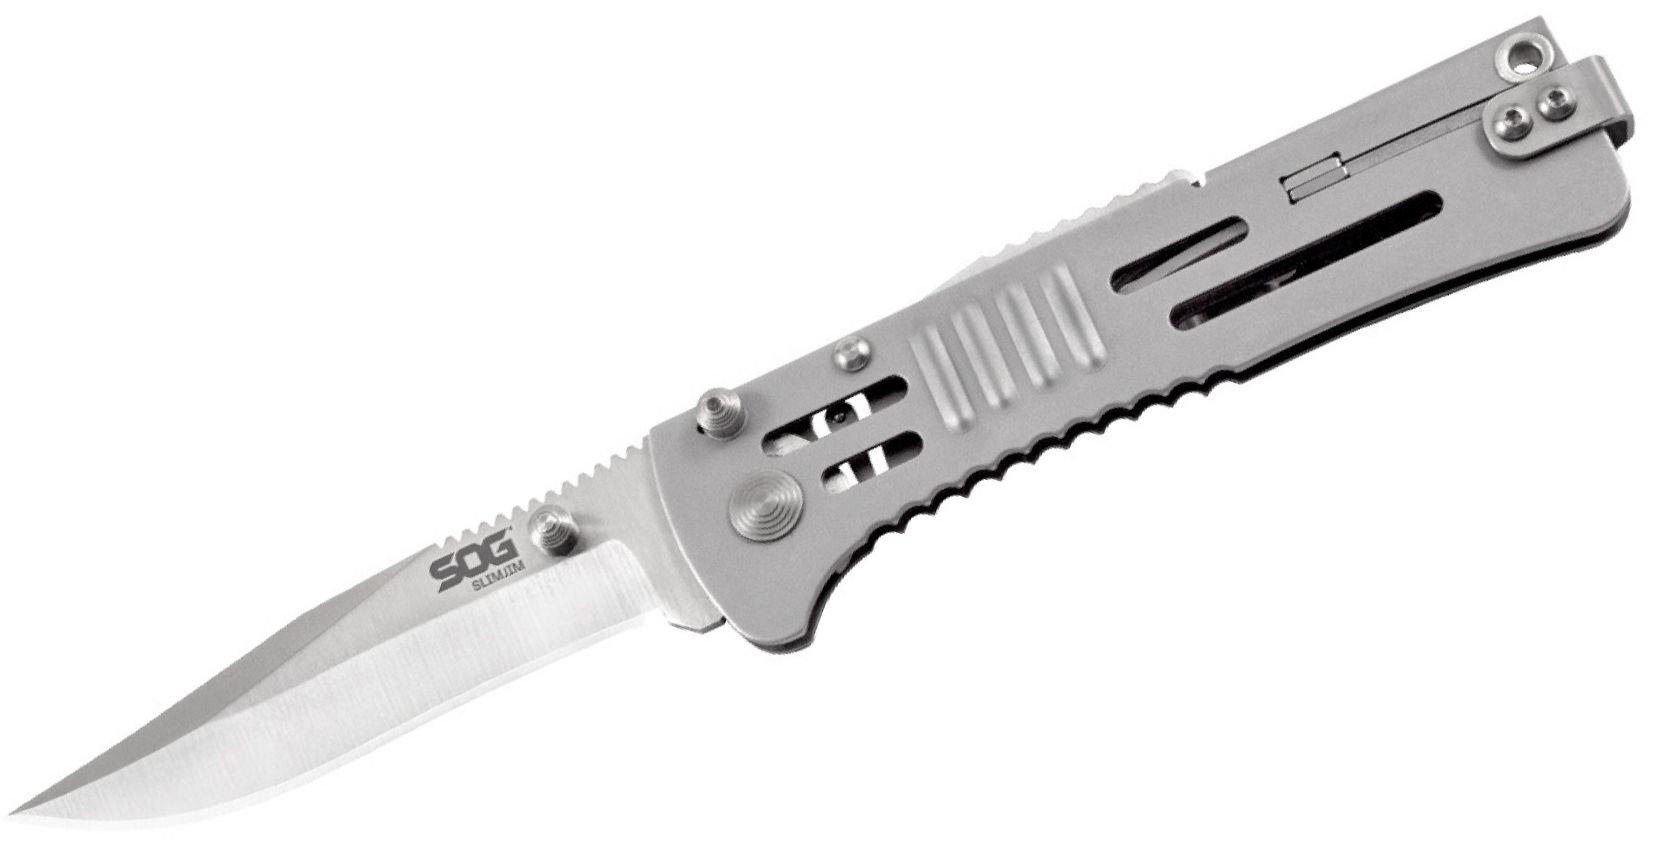 SOG SlimJim Folding Knife Assisted 3.18 inch Satin Plain Blade, Bead Blast Handles